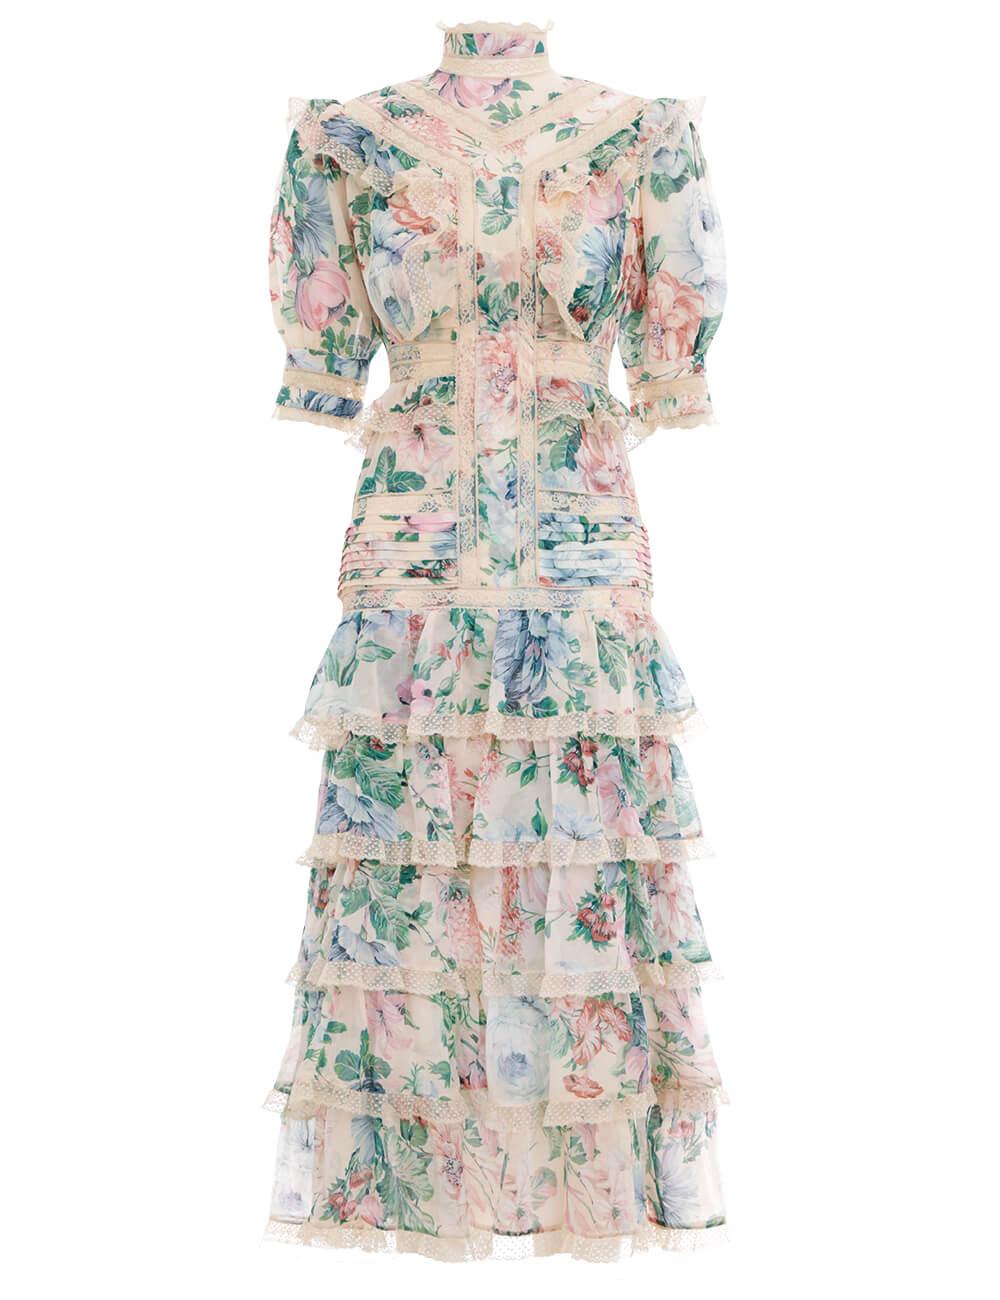 Verity Scallop Lace Dress